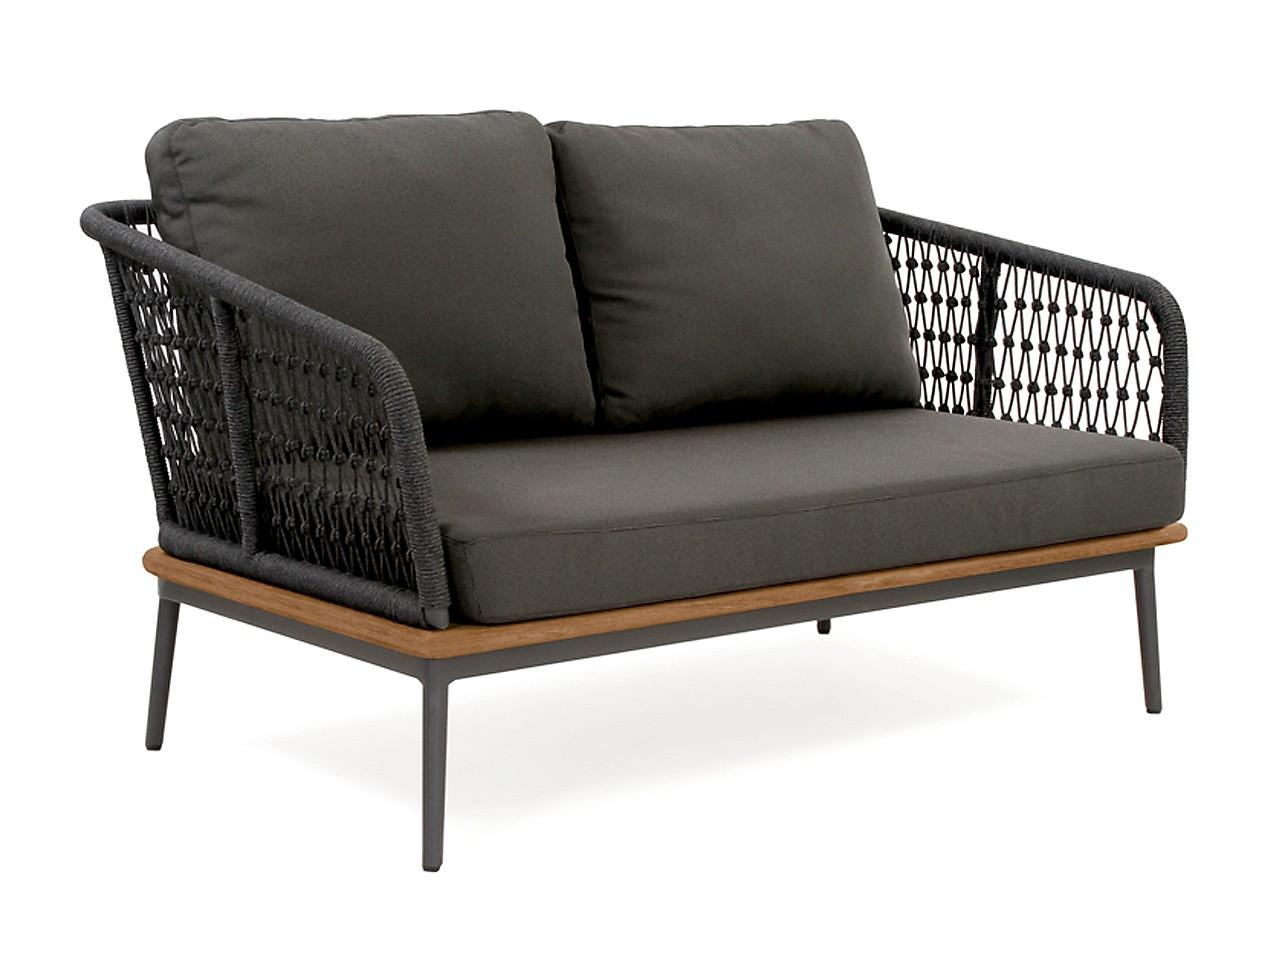 Niehoff 2-Sitzer Sofa Freeport G249.100.140